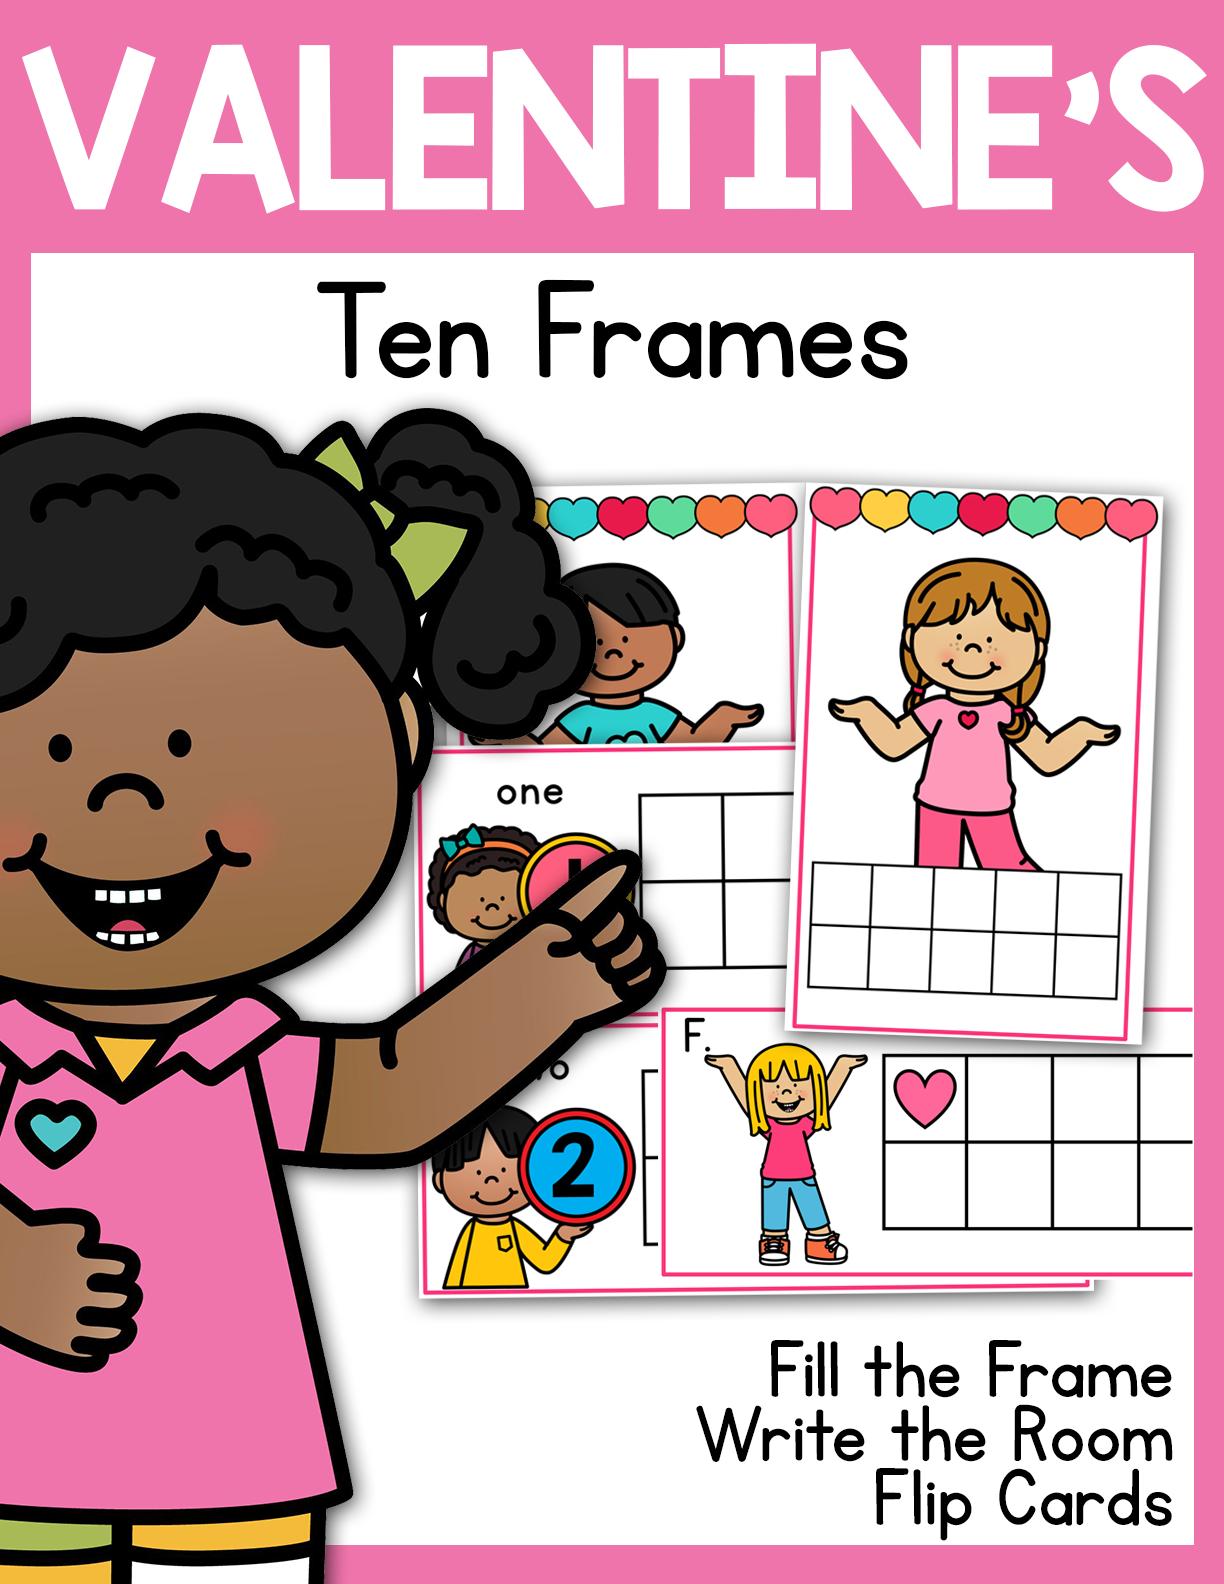 Valentine S Ten Frames 1 20 Write The Room Flip Cards